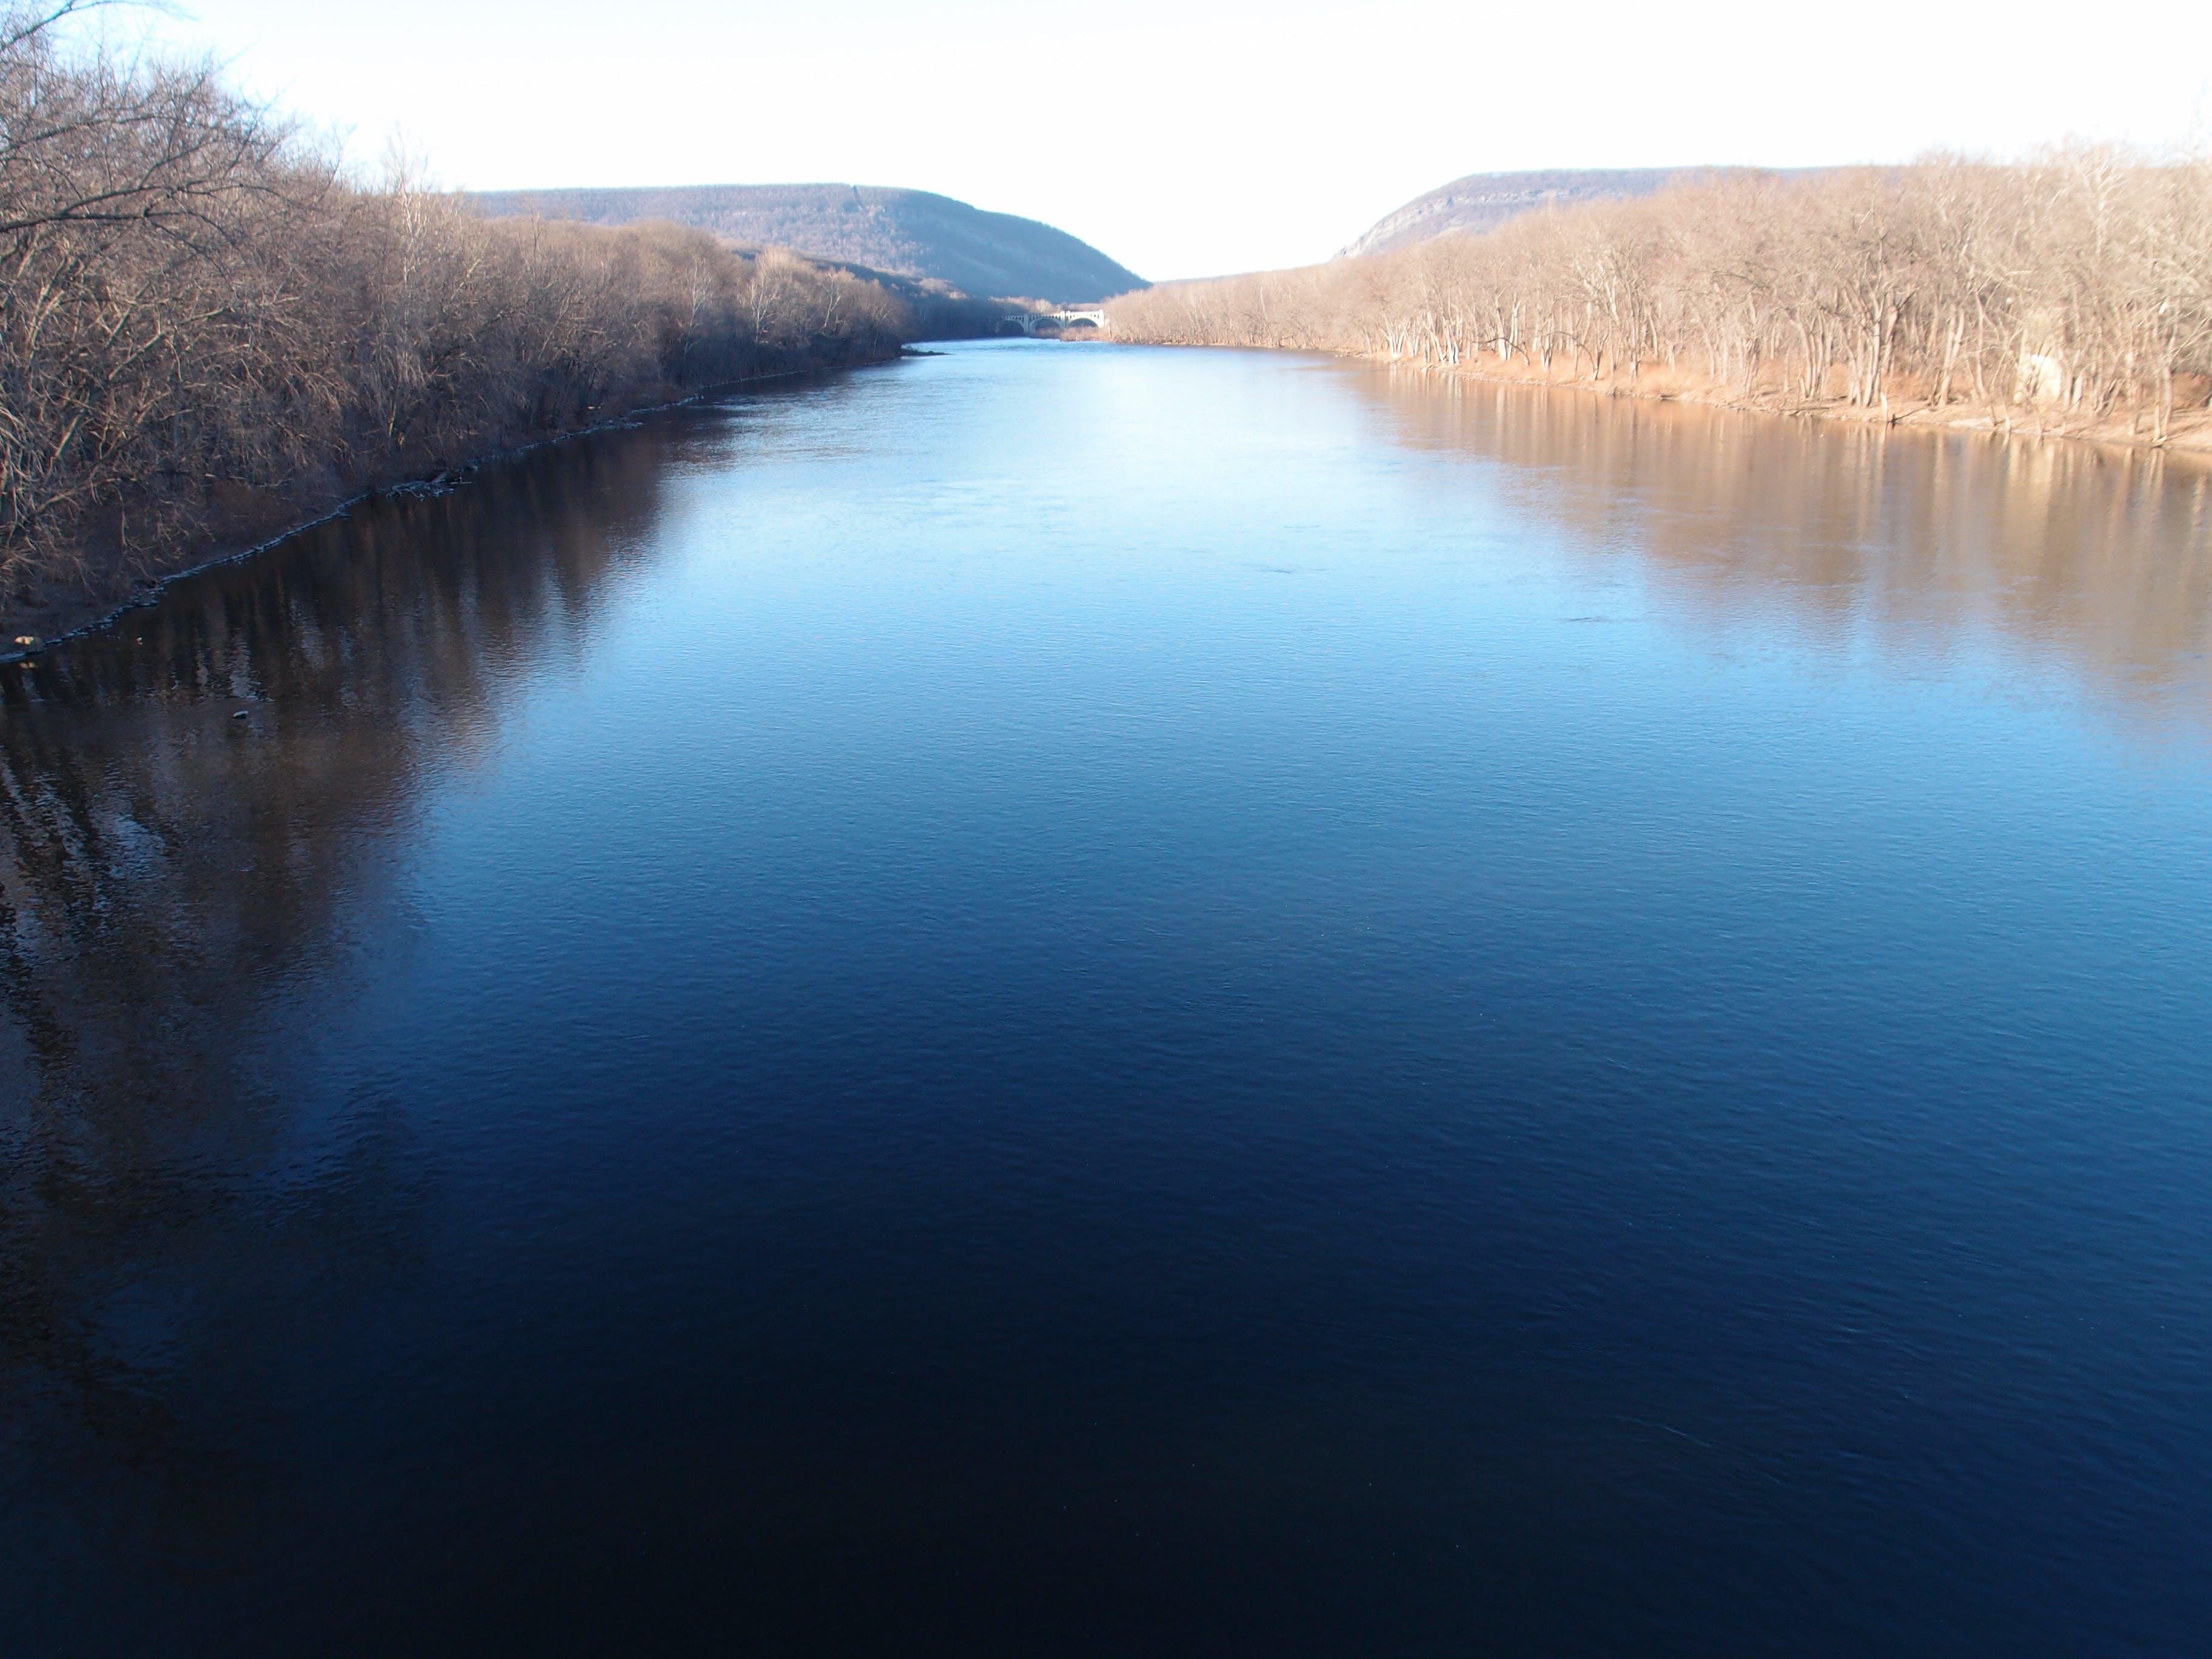 Free stock photo of Delaware river, river